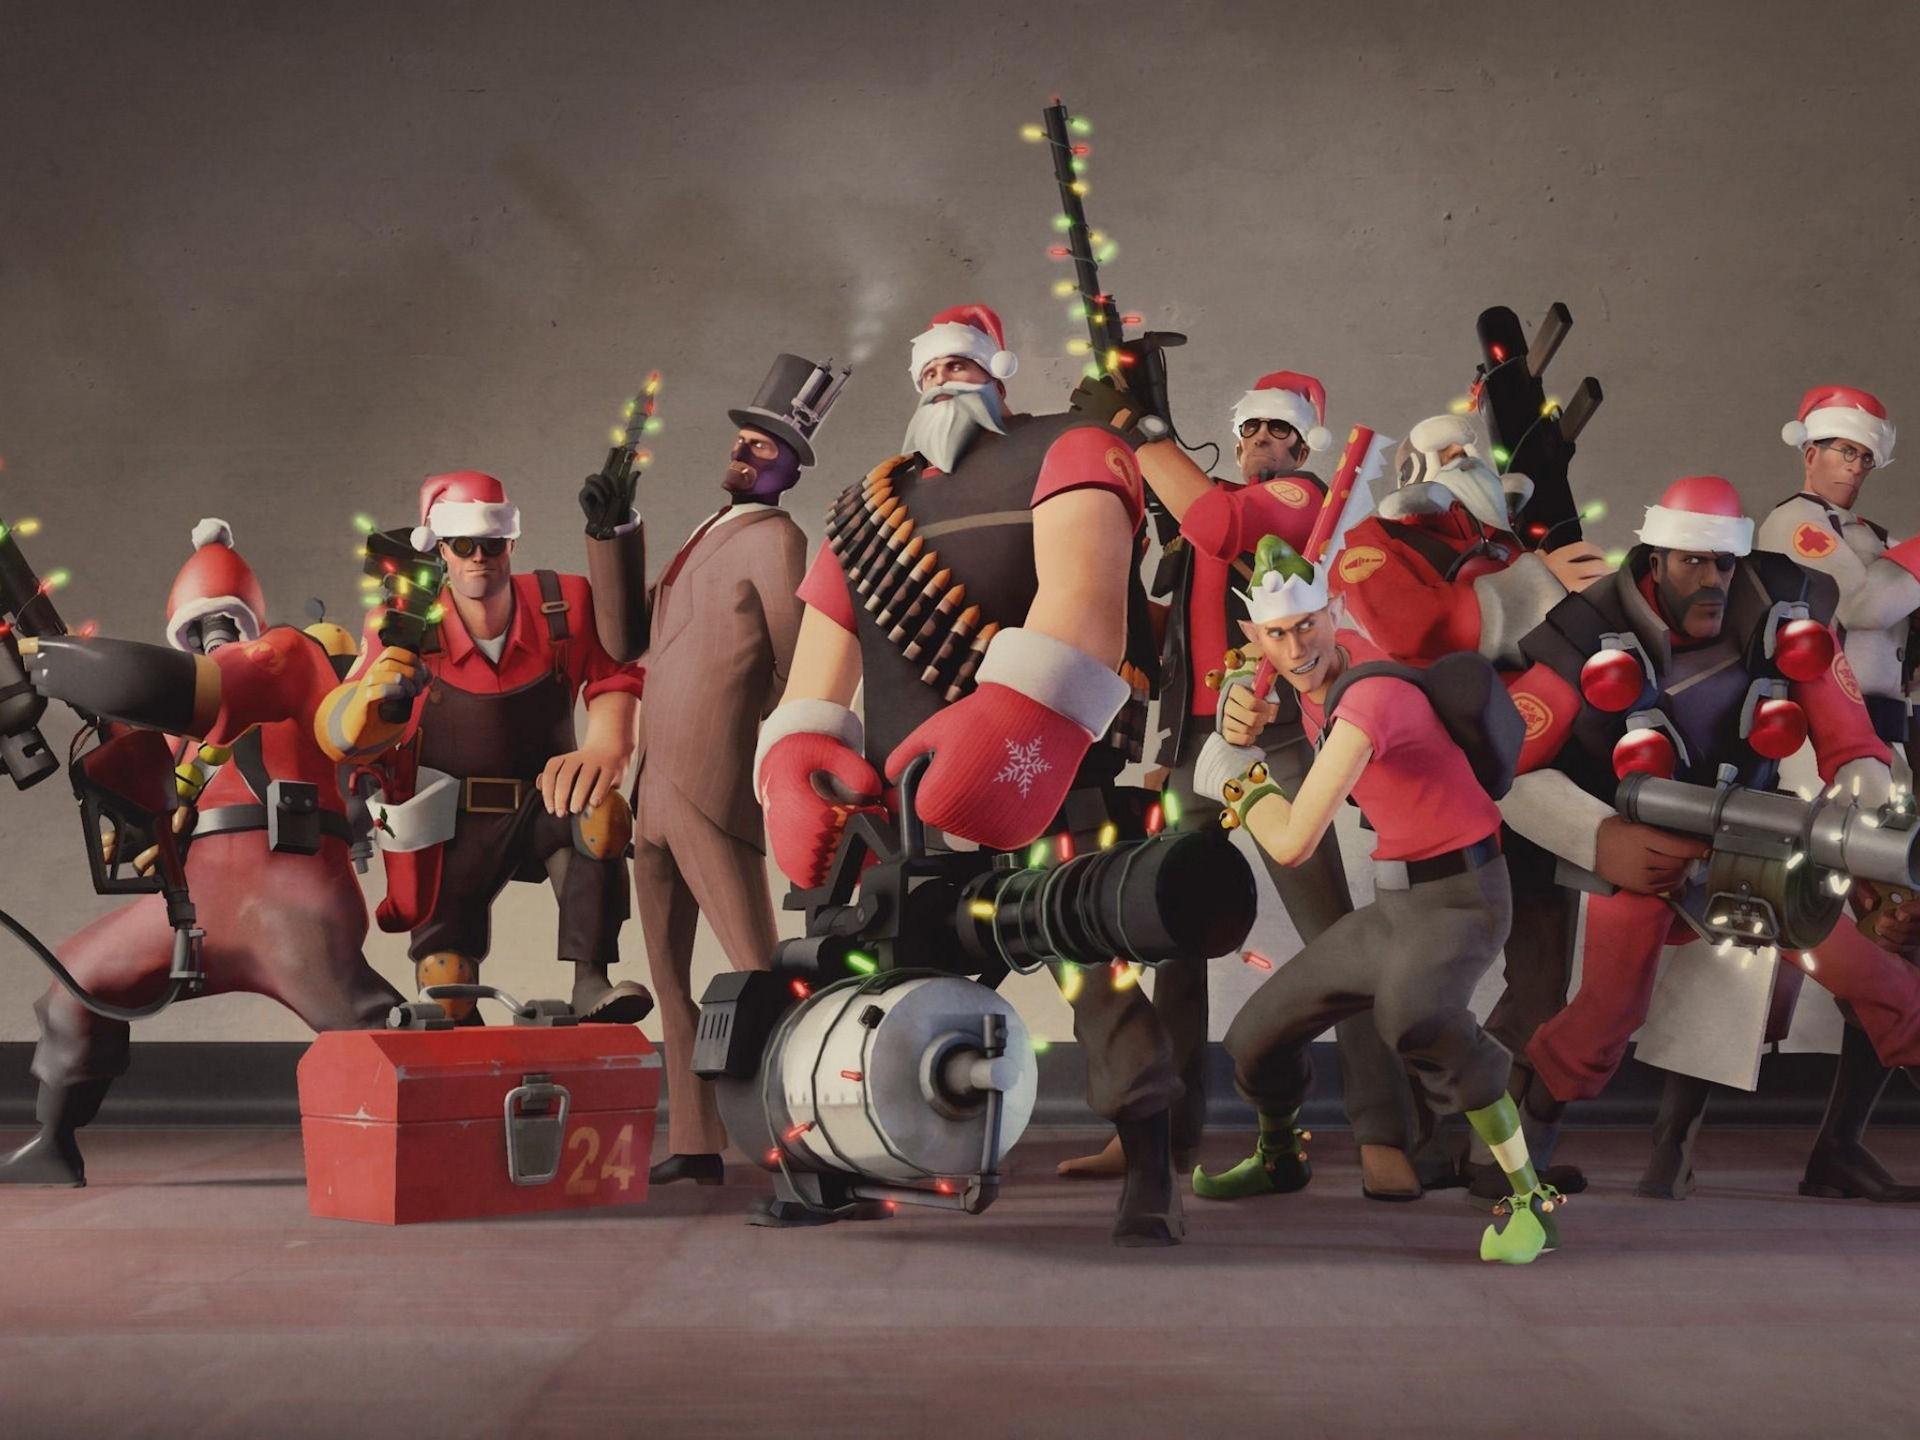 Team Fortress Christmas Wallpaper